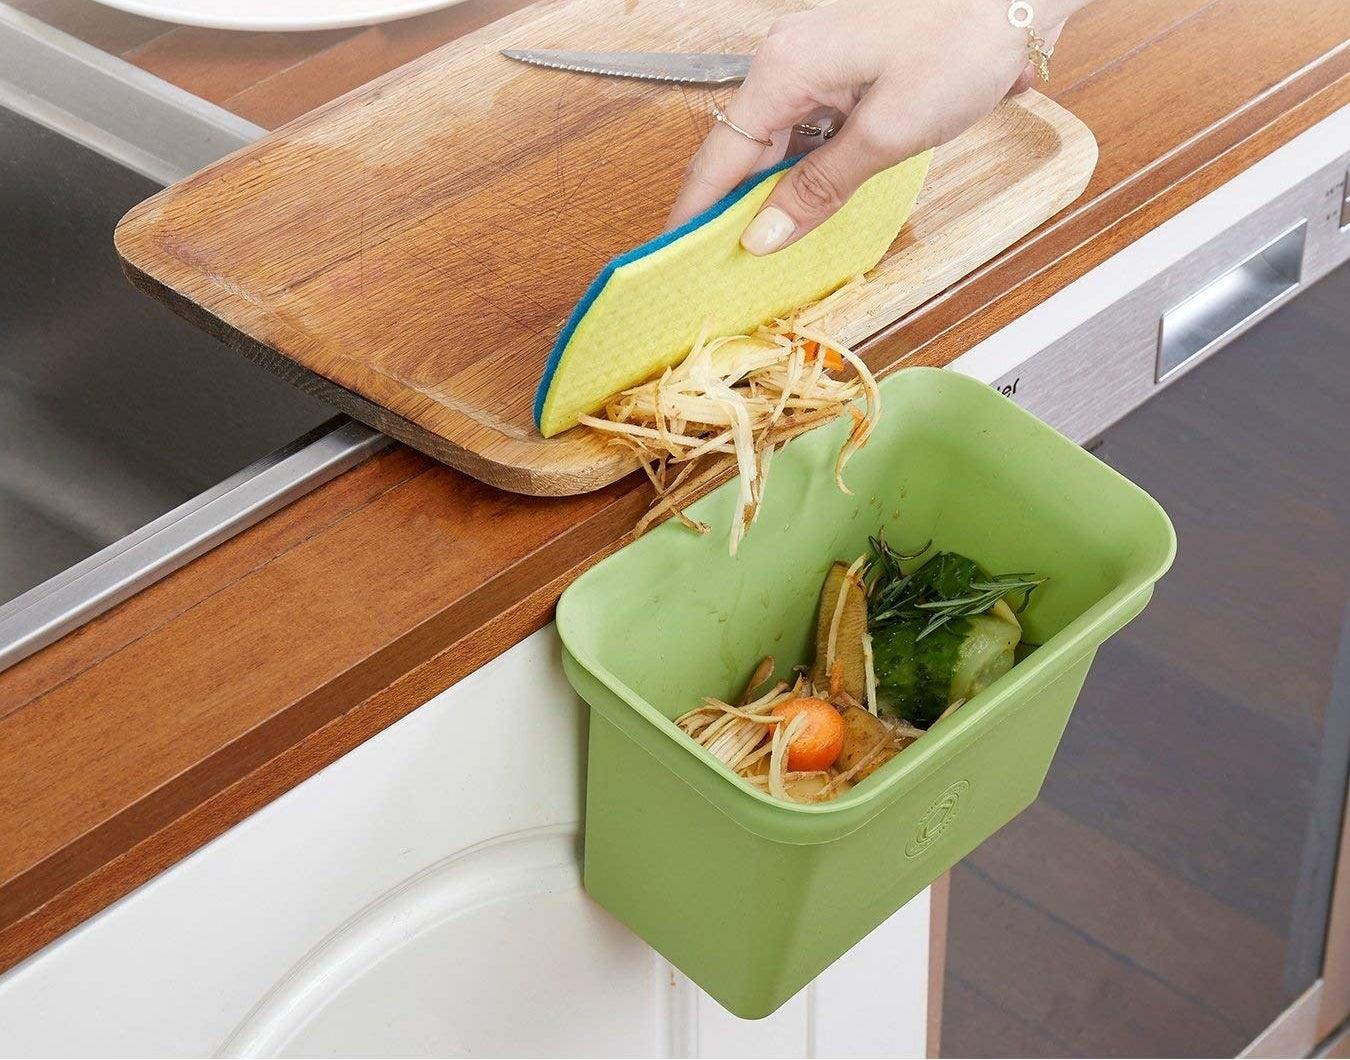 person swipes food scraps into bin